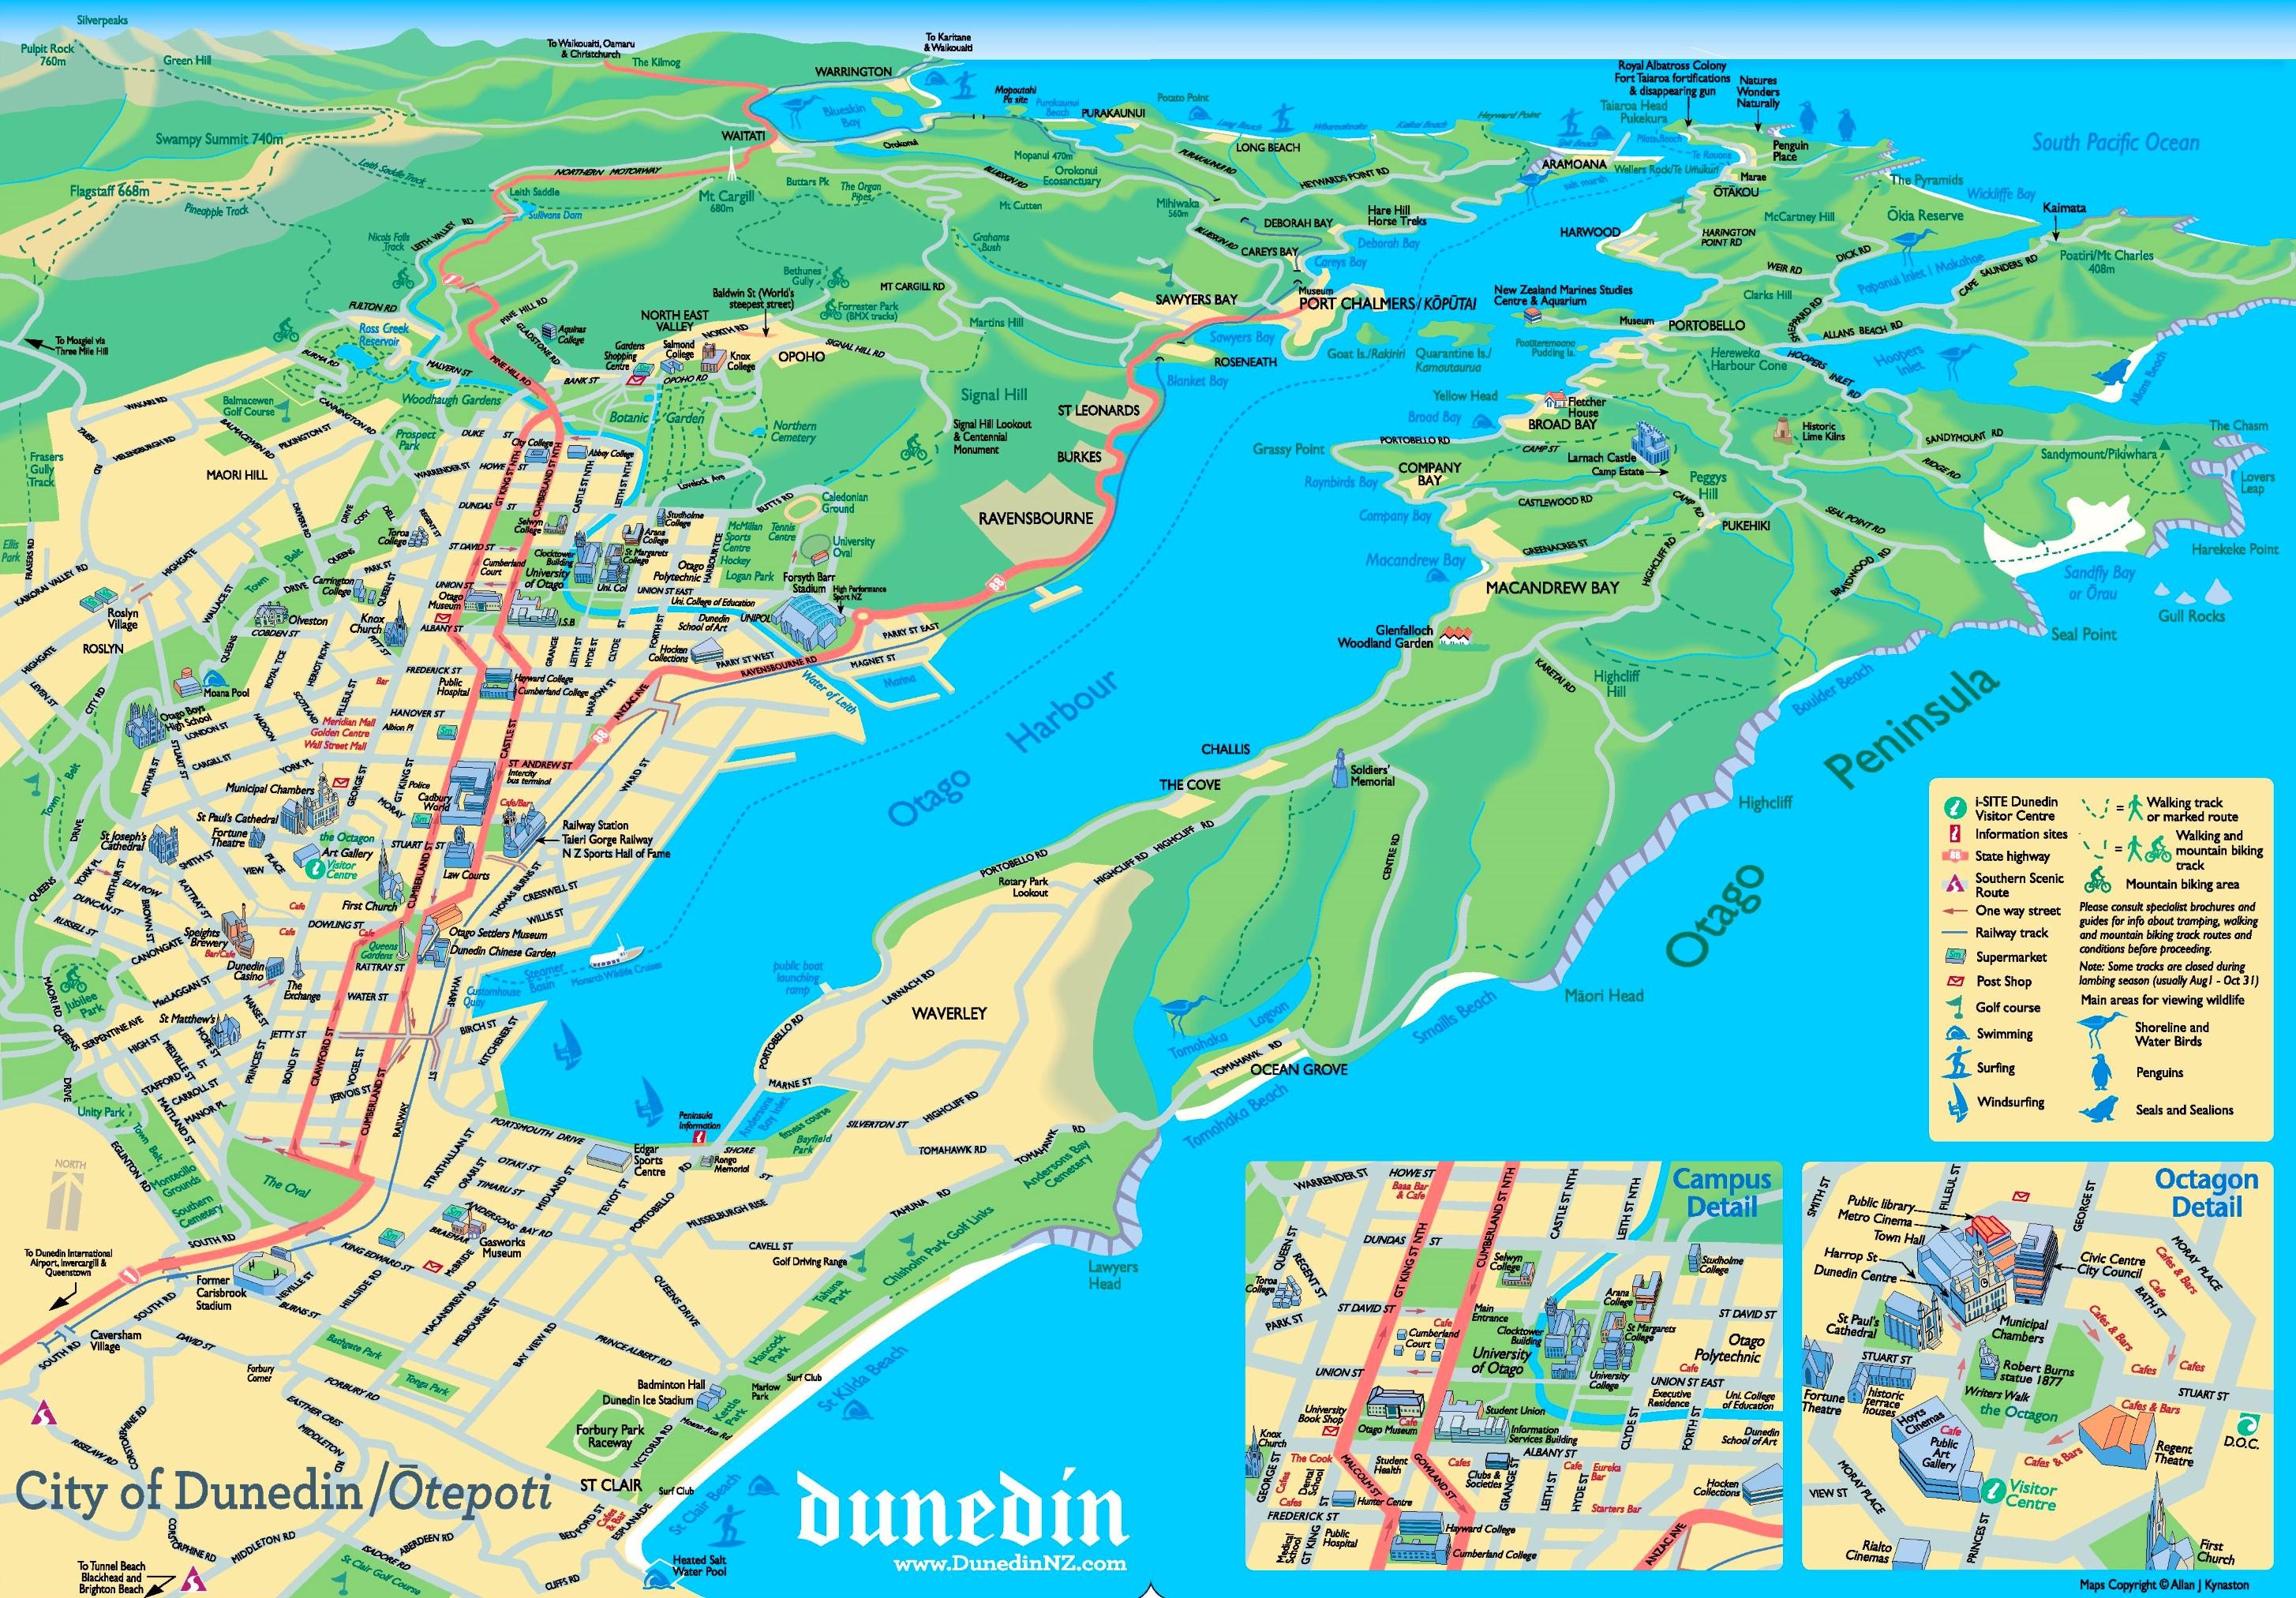 Map Of Dunedin New Zealand.Dunedin Tourist Map